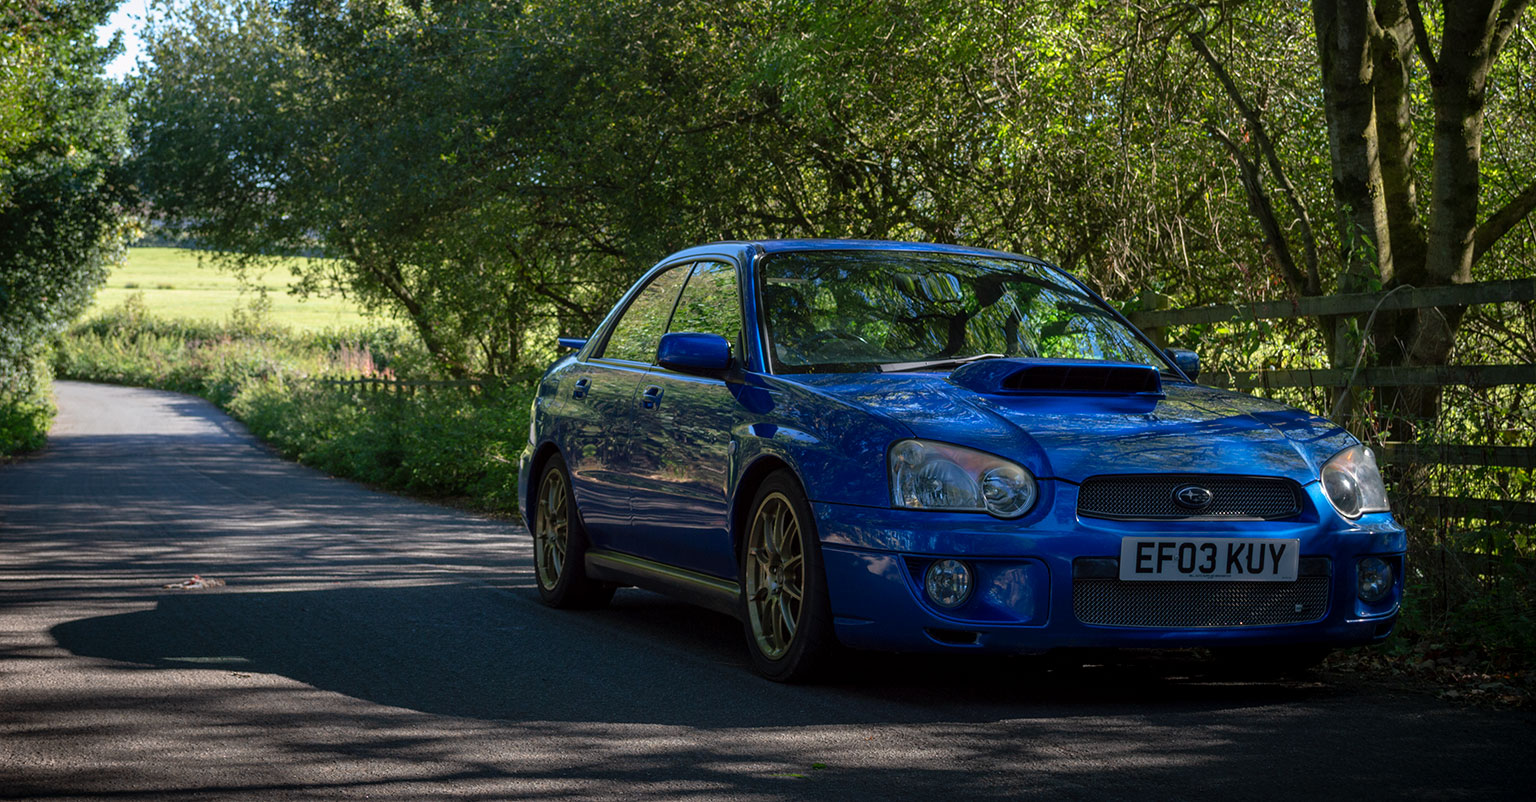 SuperPro 2003 Subaru Impreza WRX